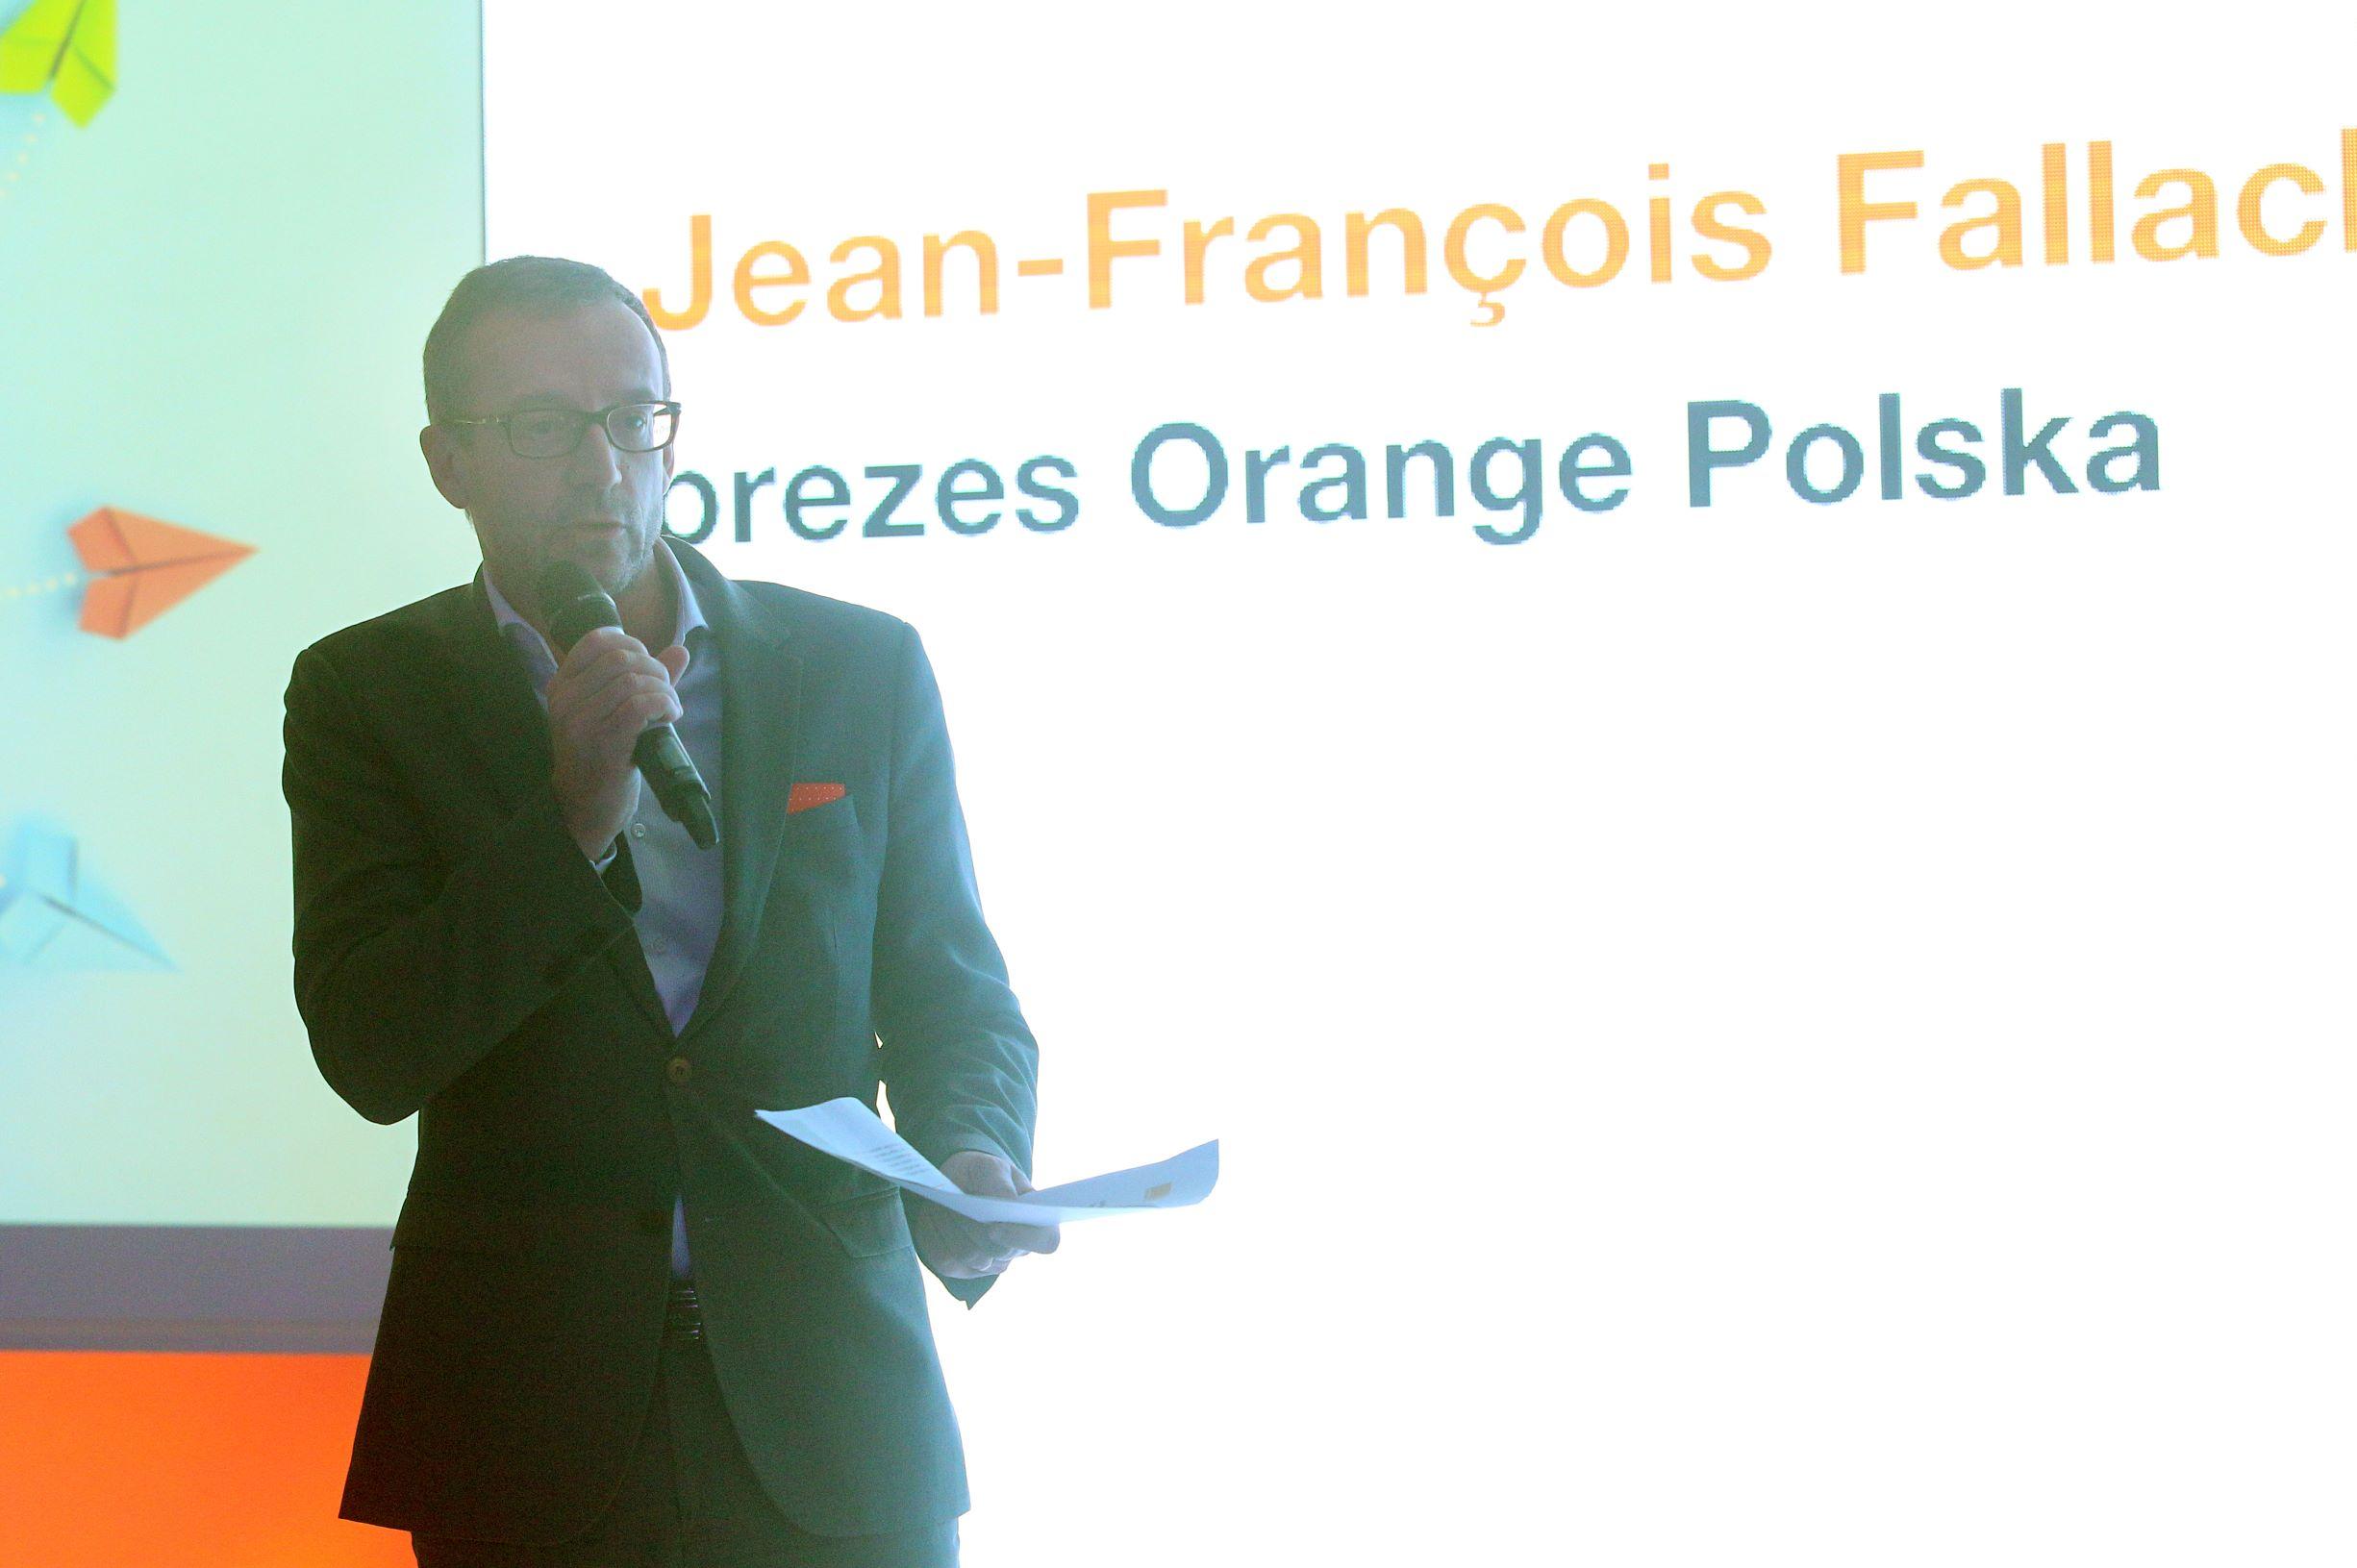 Jean-François Fallacher, prezes Orange Polska (fot. Konrad Korgul)